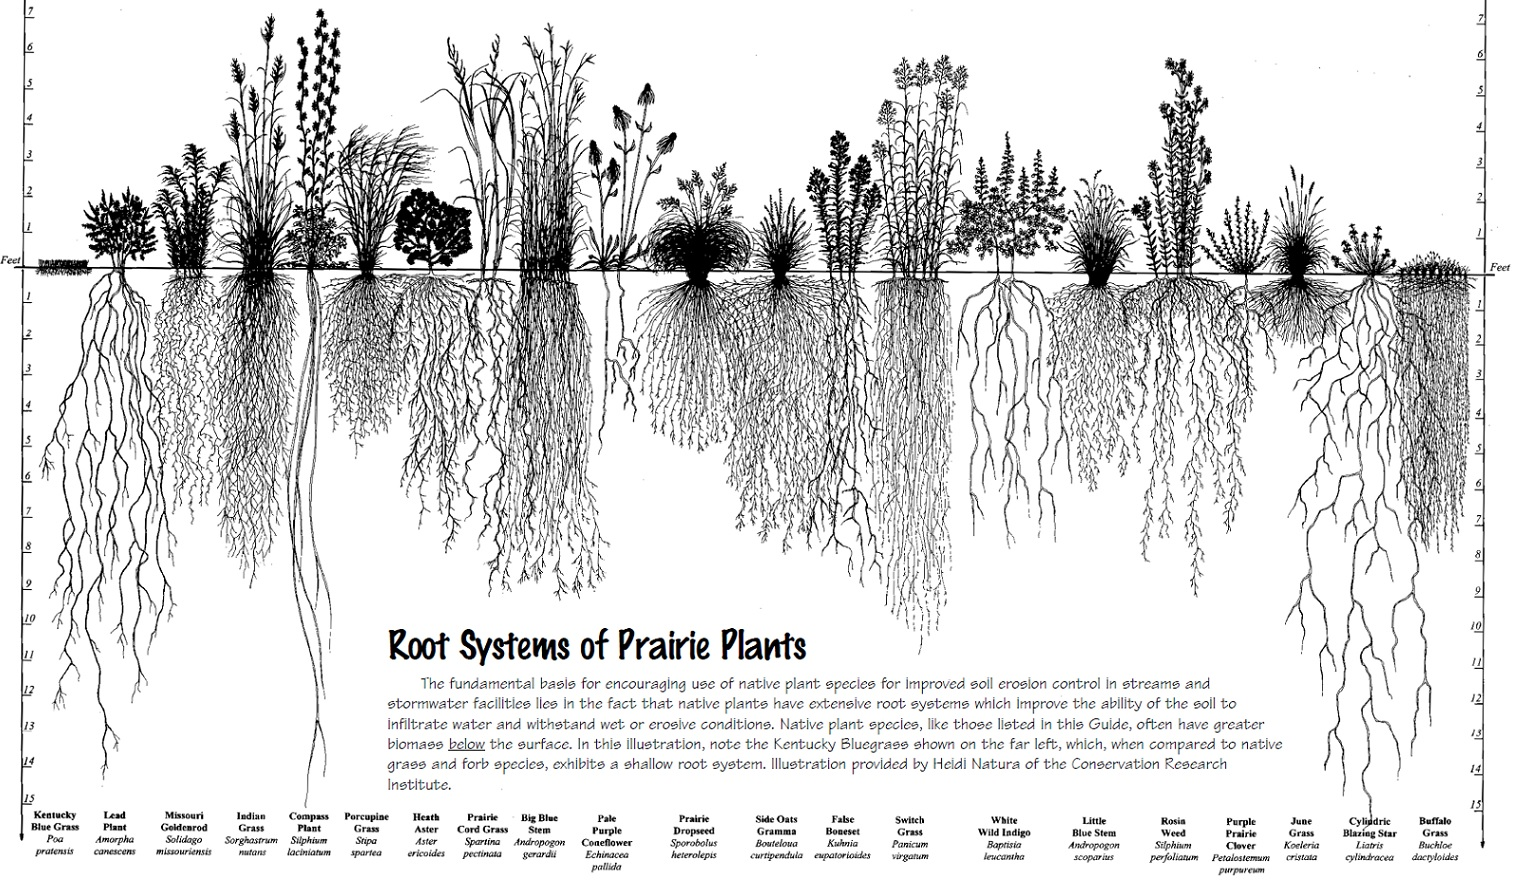 root systems of prairie Plants.jpg